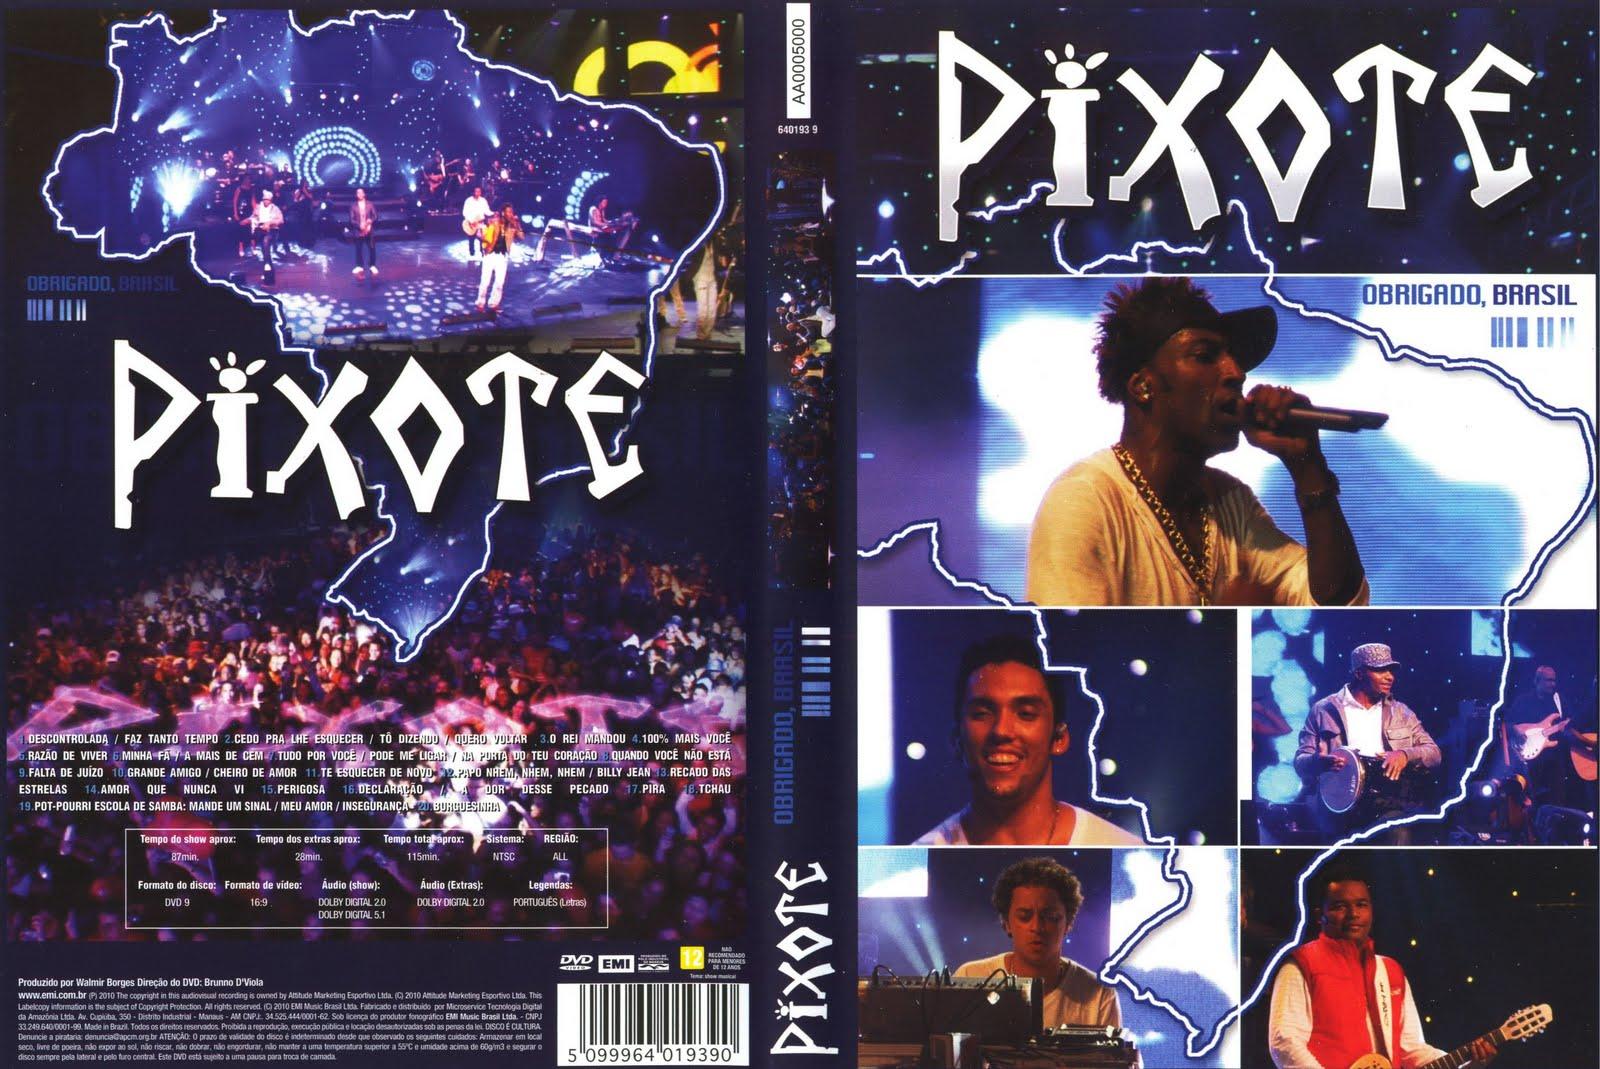 CD PIXOTE GRATIS 2010 DO BAIXAR